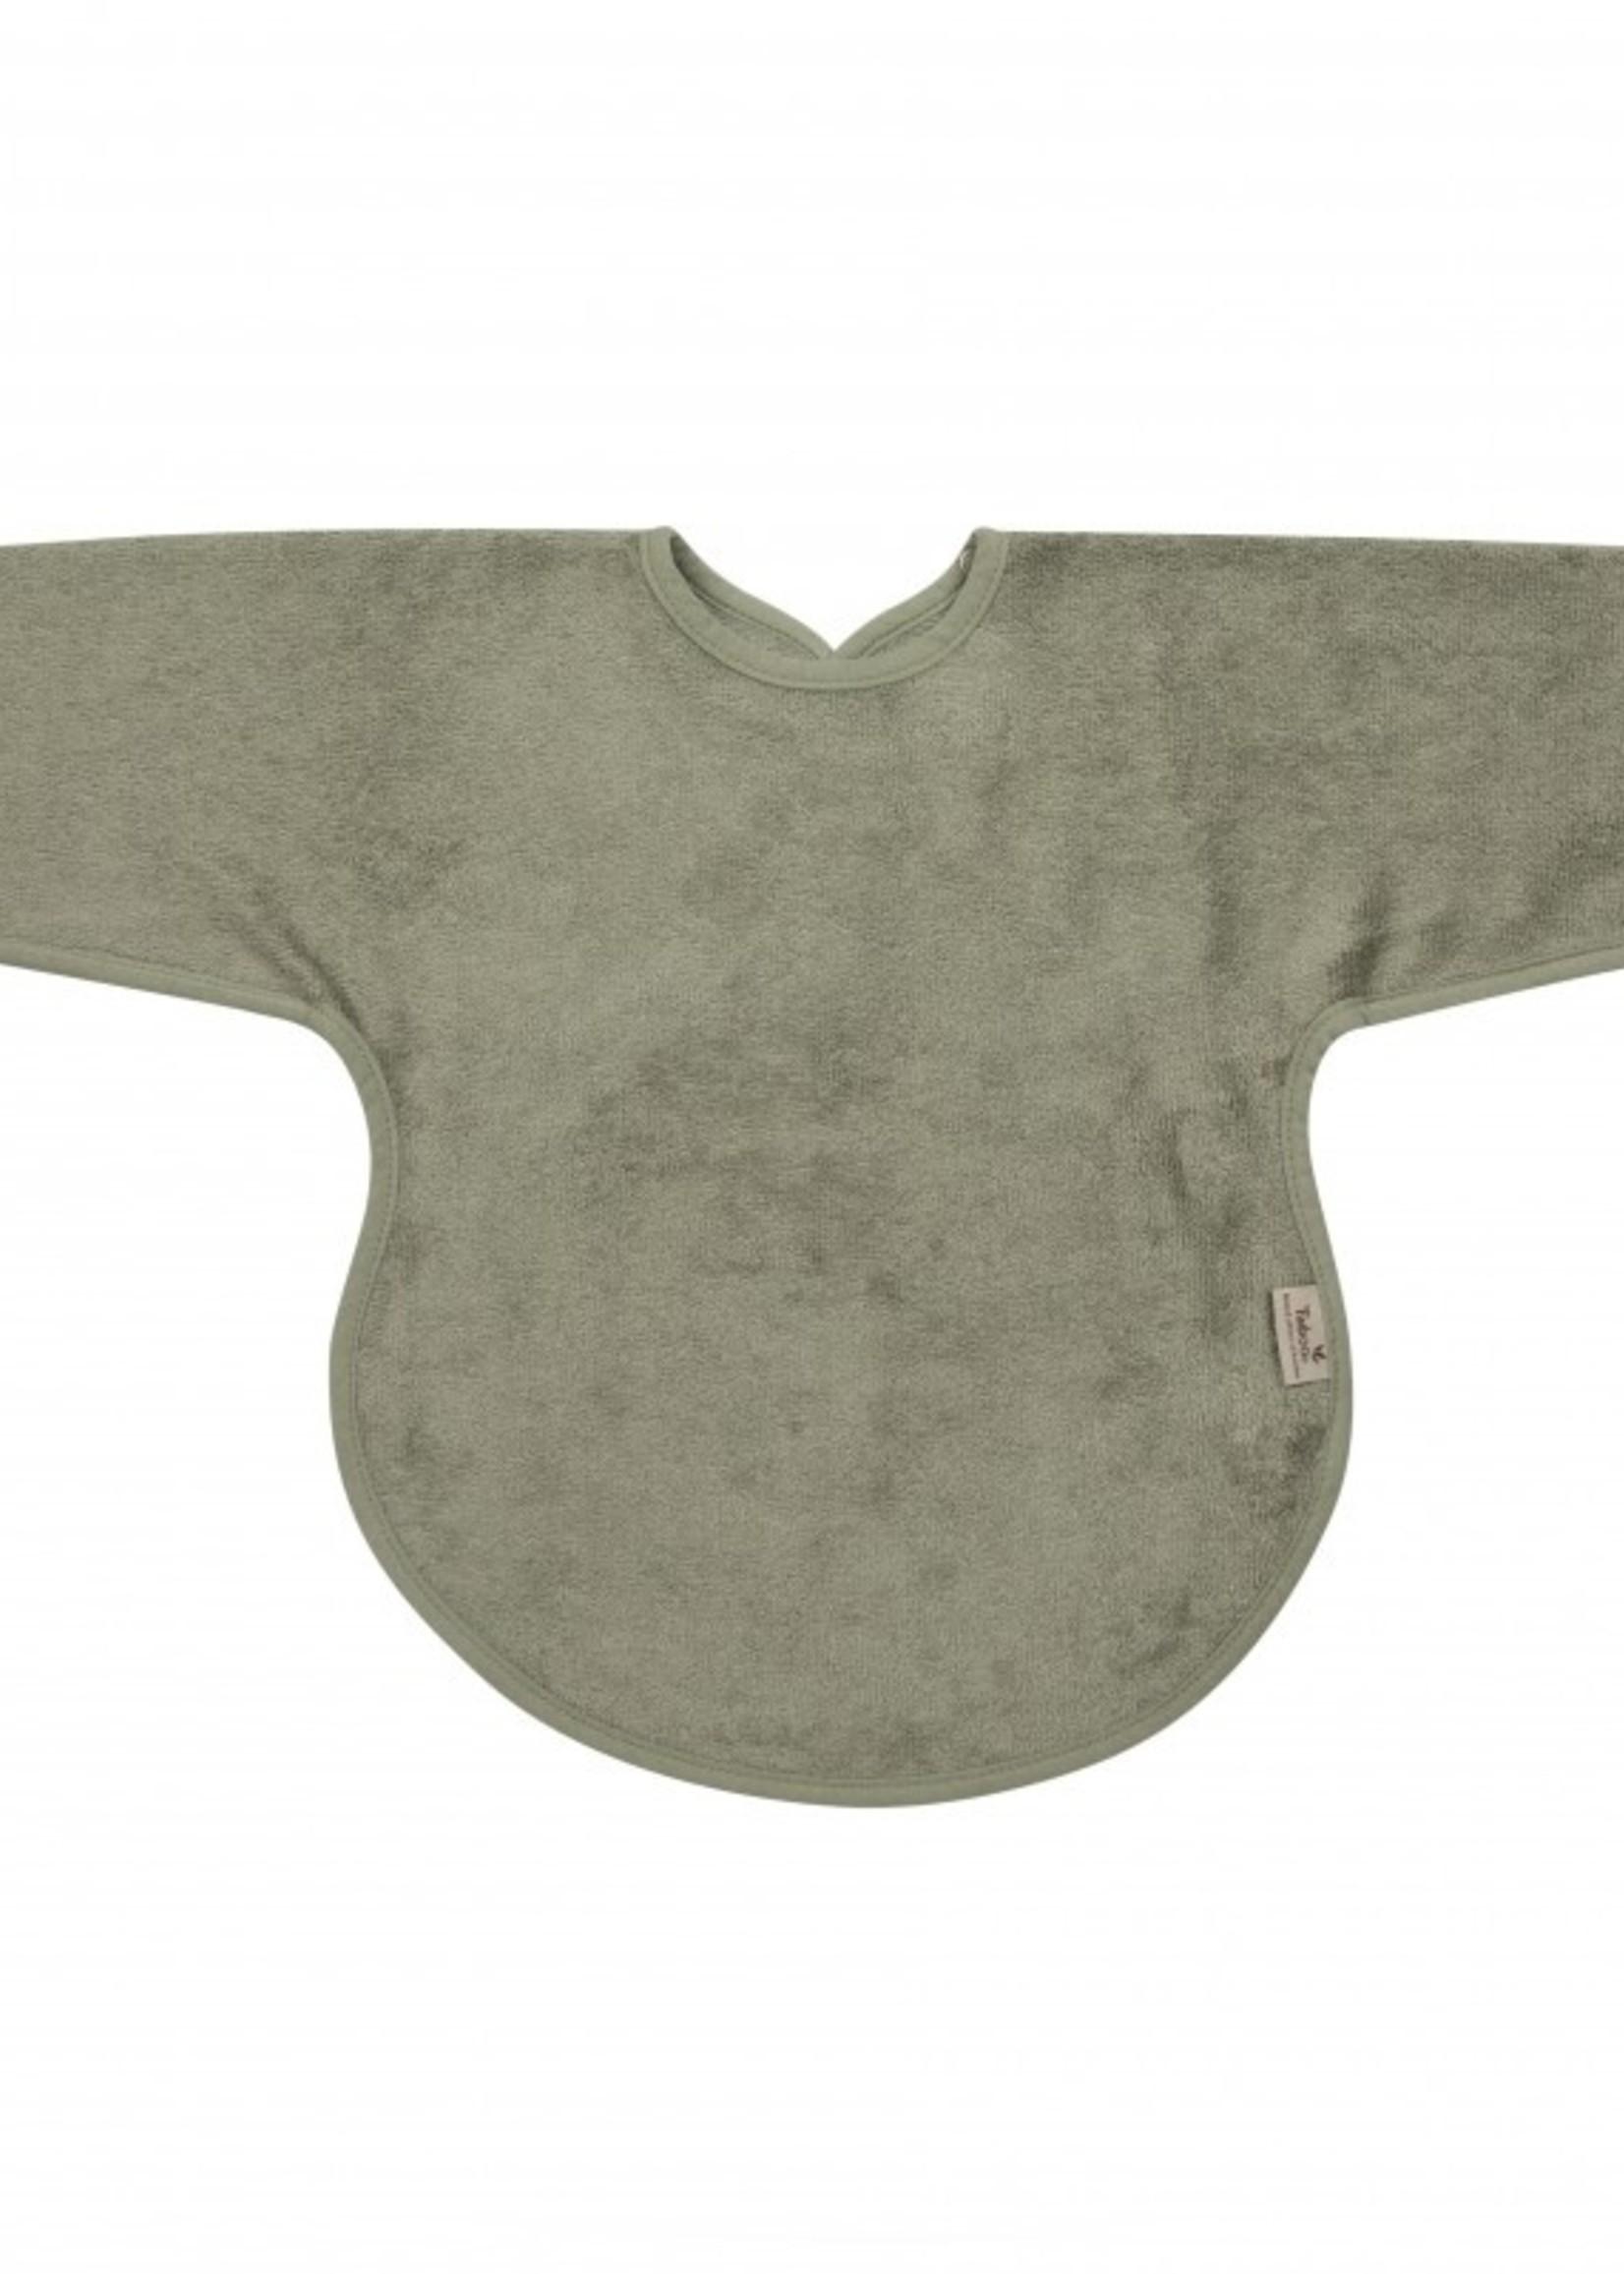 Timboo Bib Long Sleeve - Whisper Green